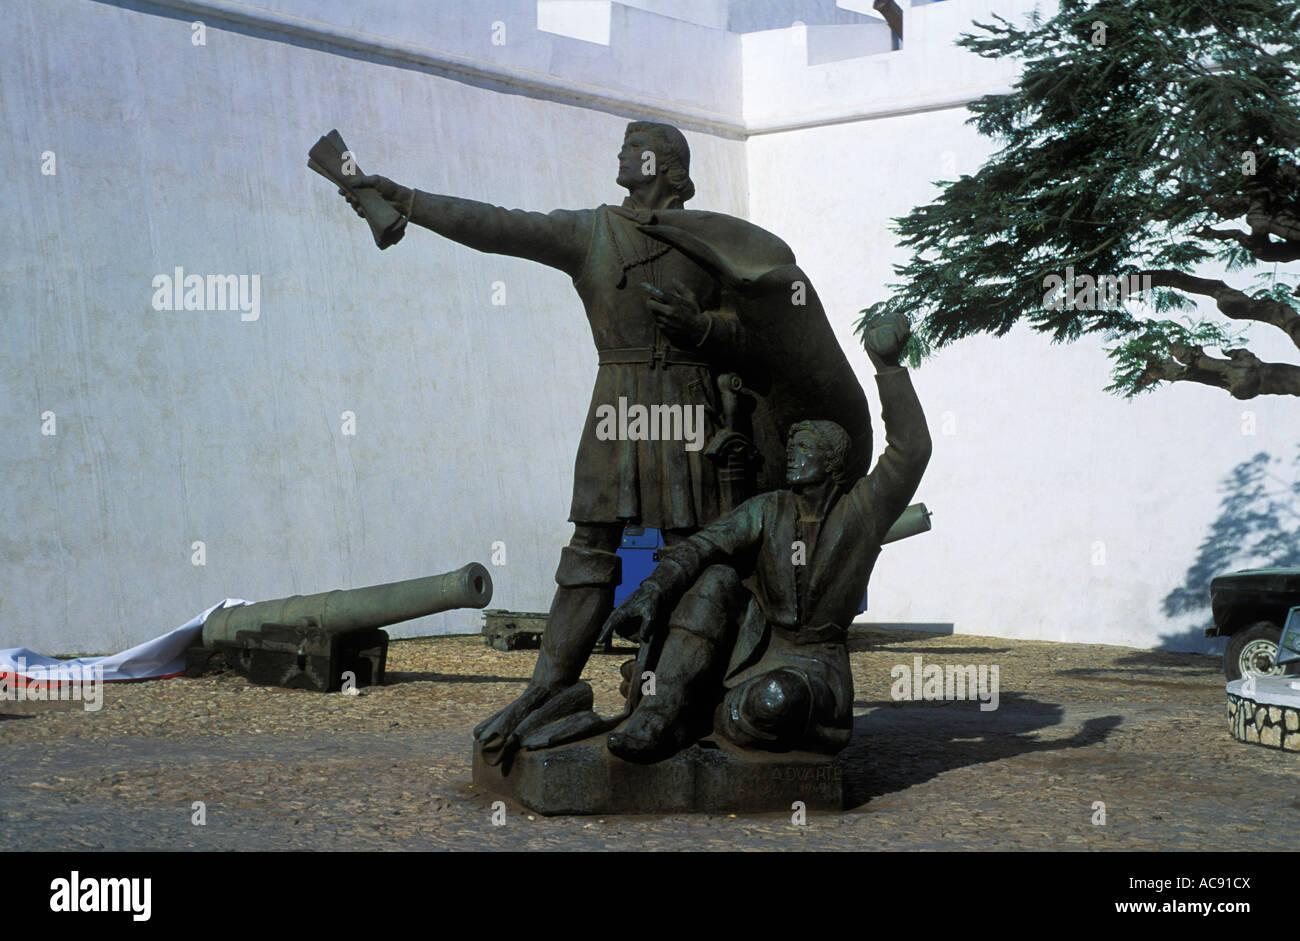 Statue at fort Luanda; Angola - Stock Image